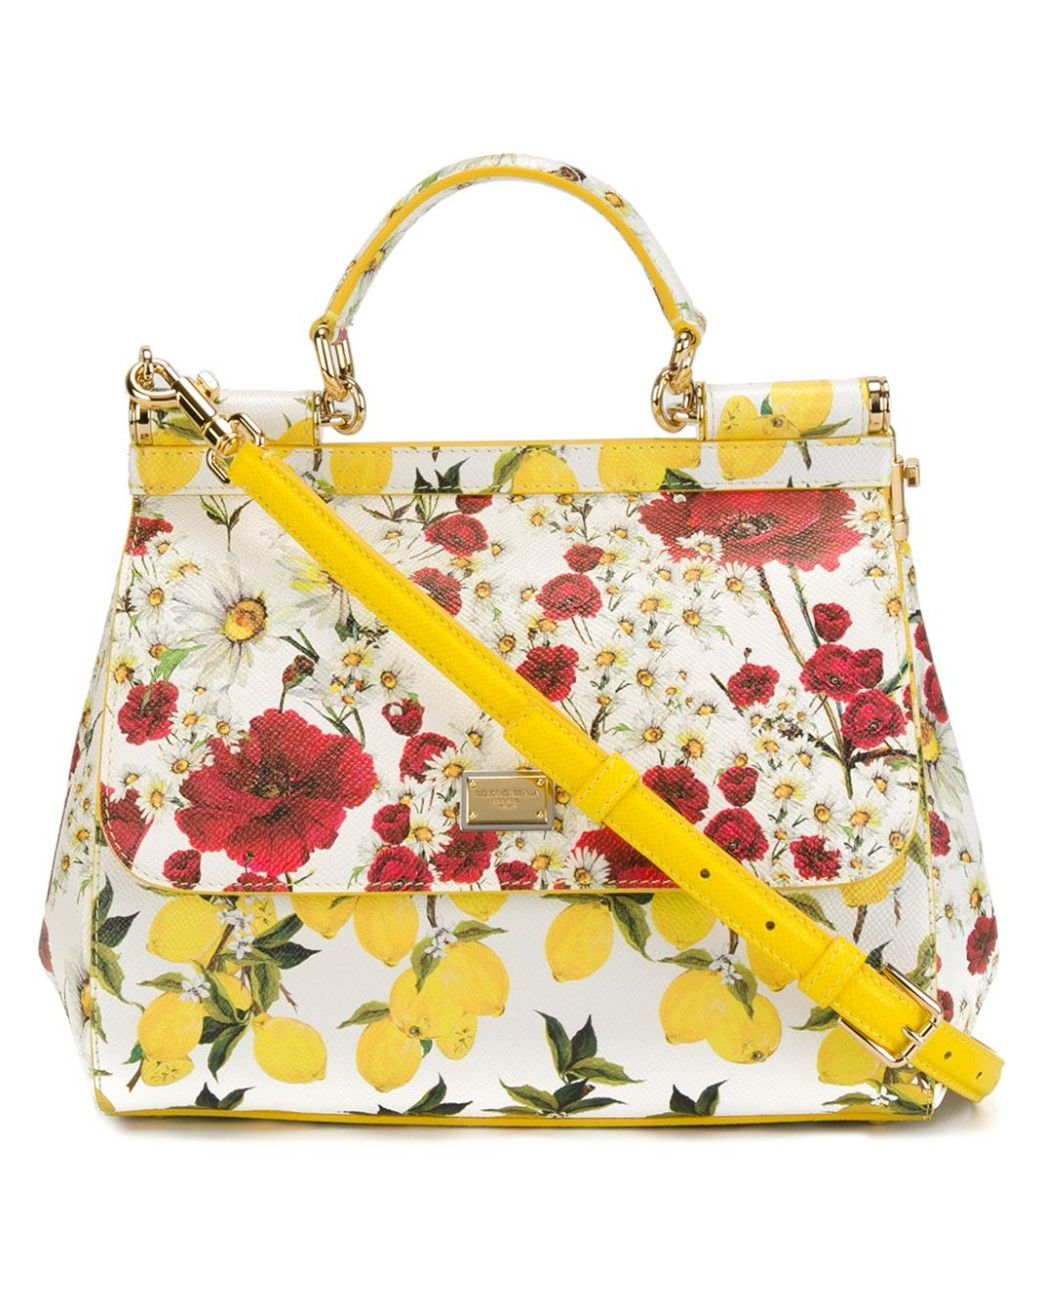 46fb07633324 Dolce   Gabbana Shoulder Bags